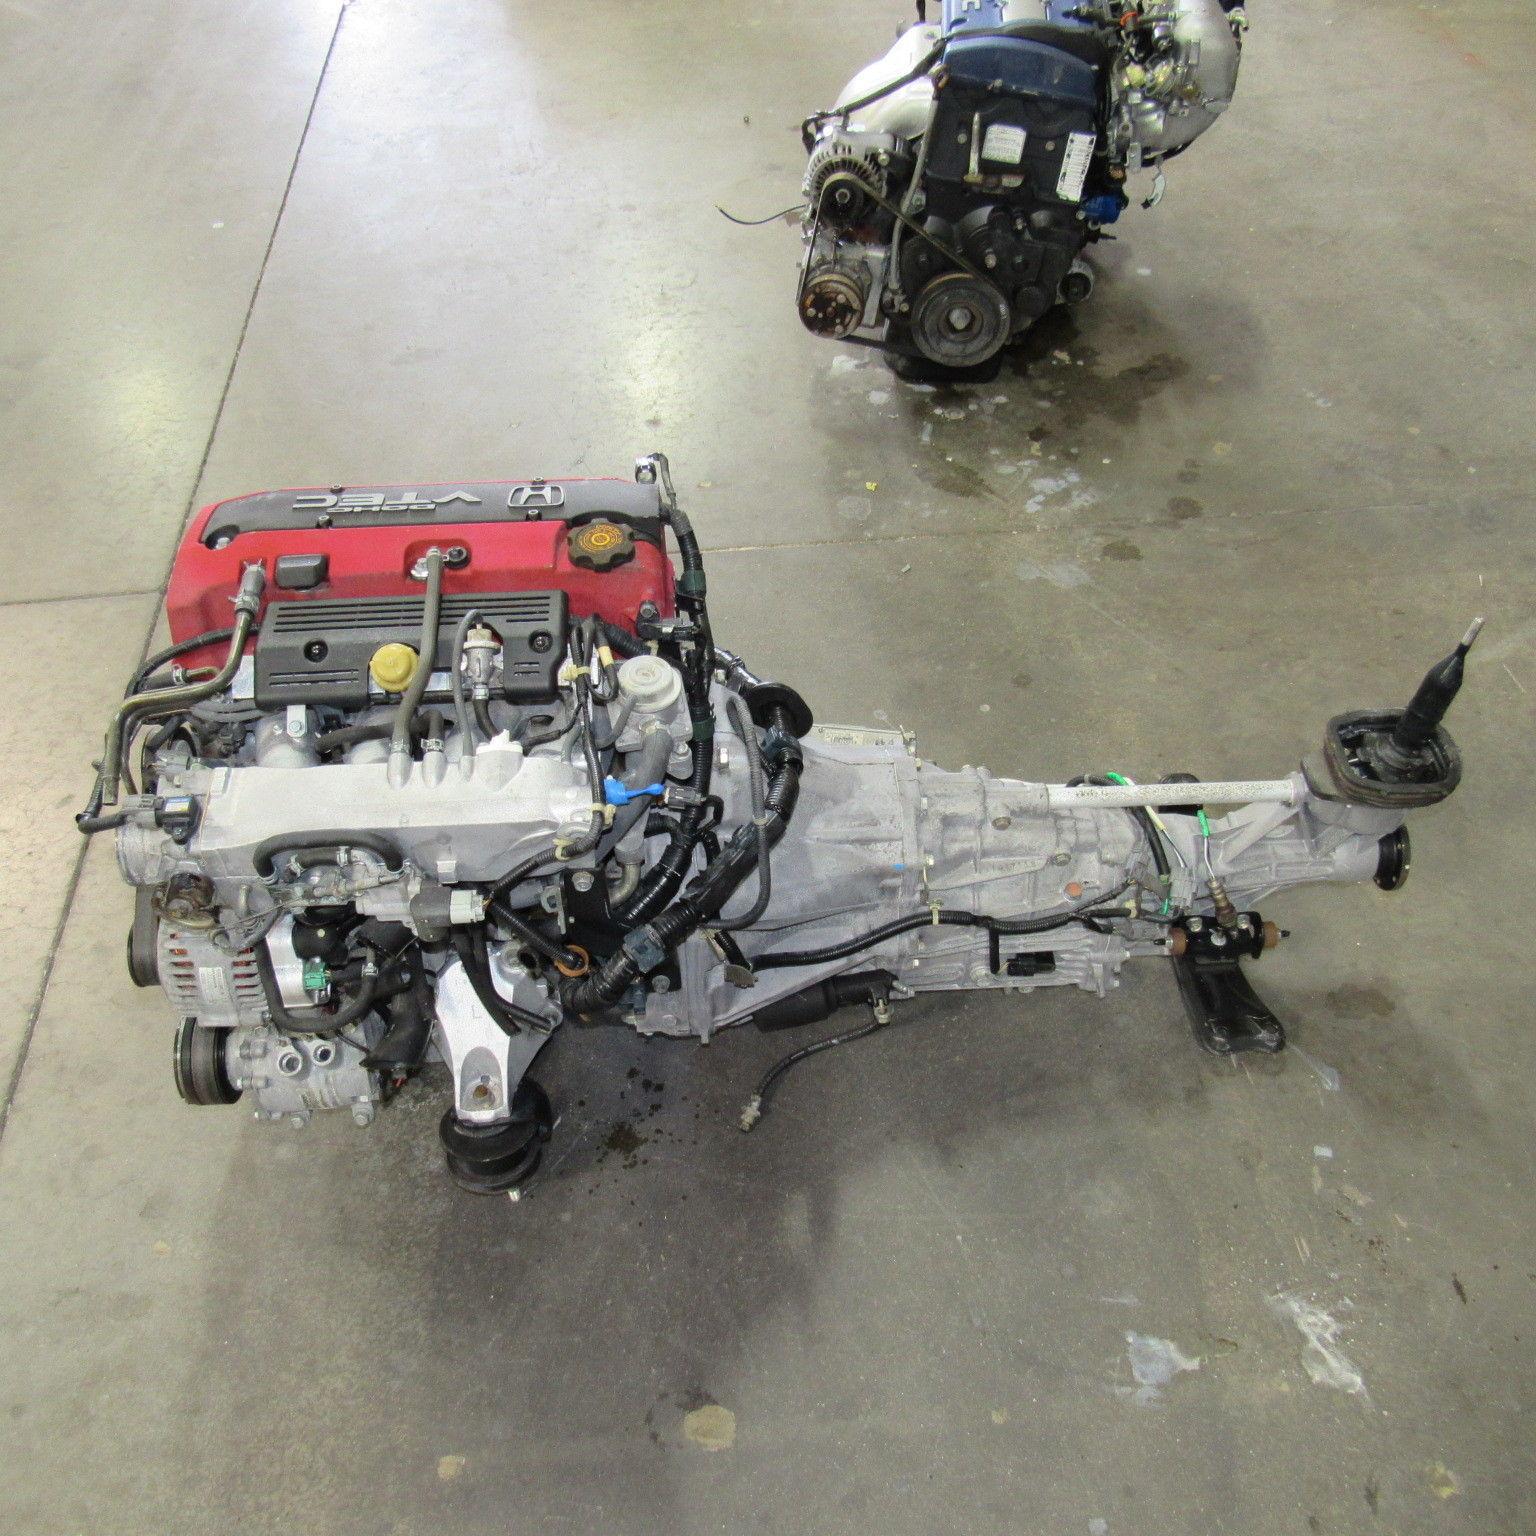 S2000 Honda Cylinder Heads: JDM Honda F20C VTEC Engine And 6 Speed Transmission S2000